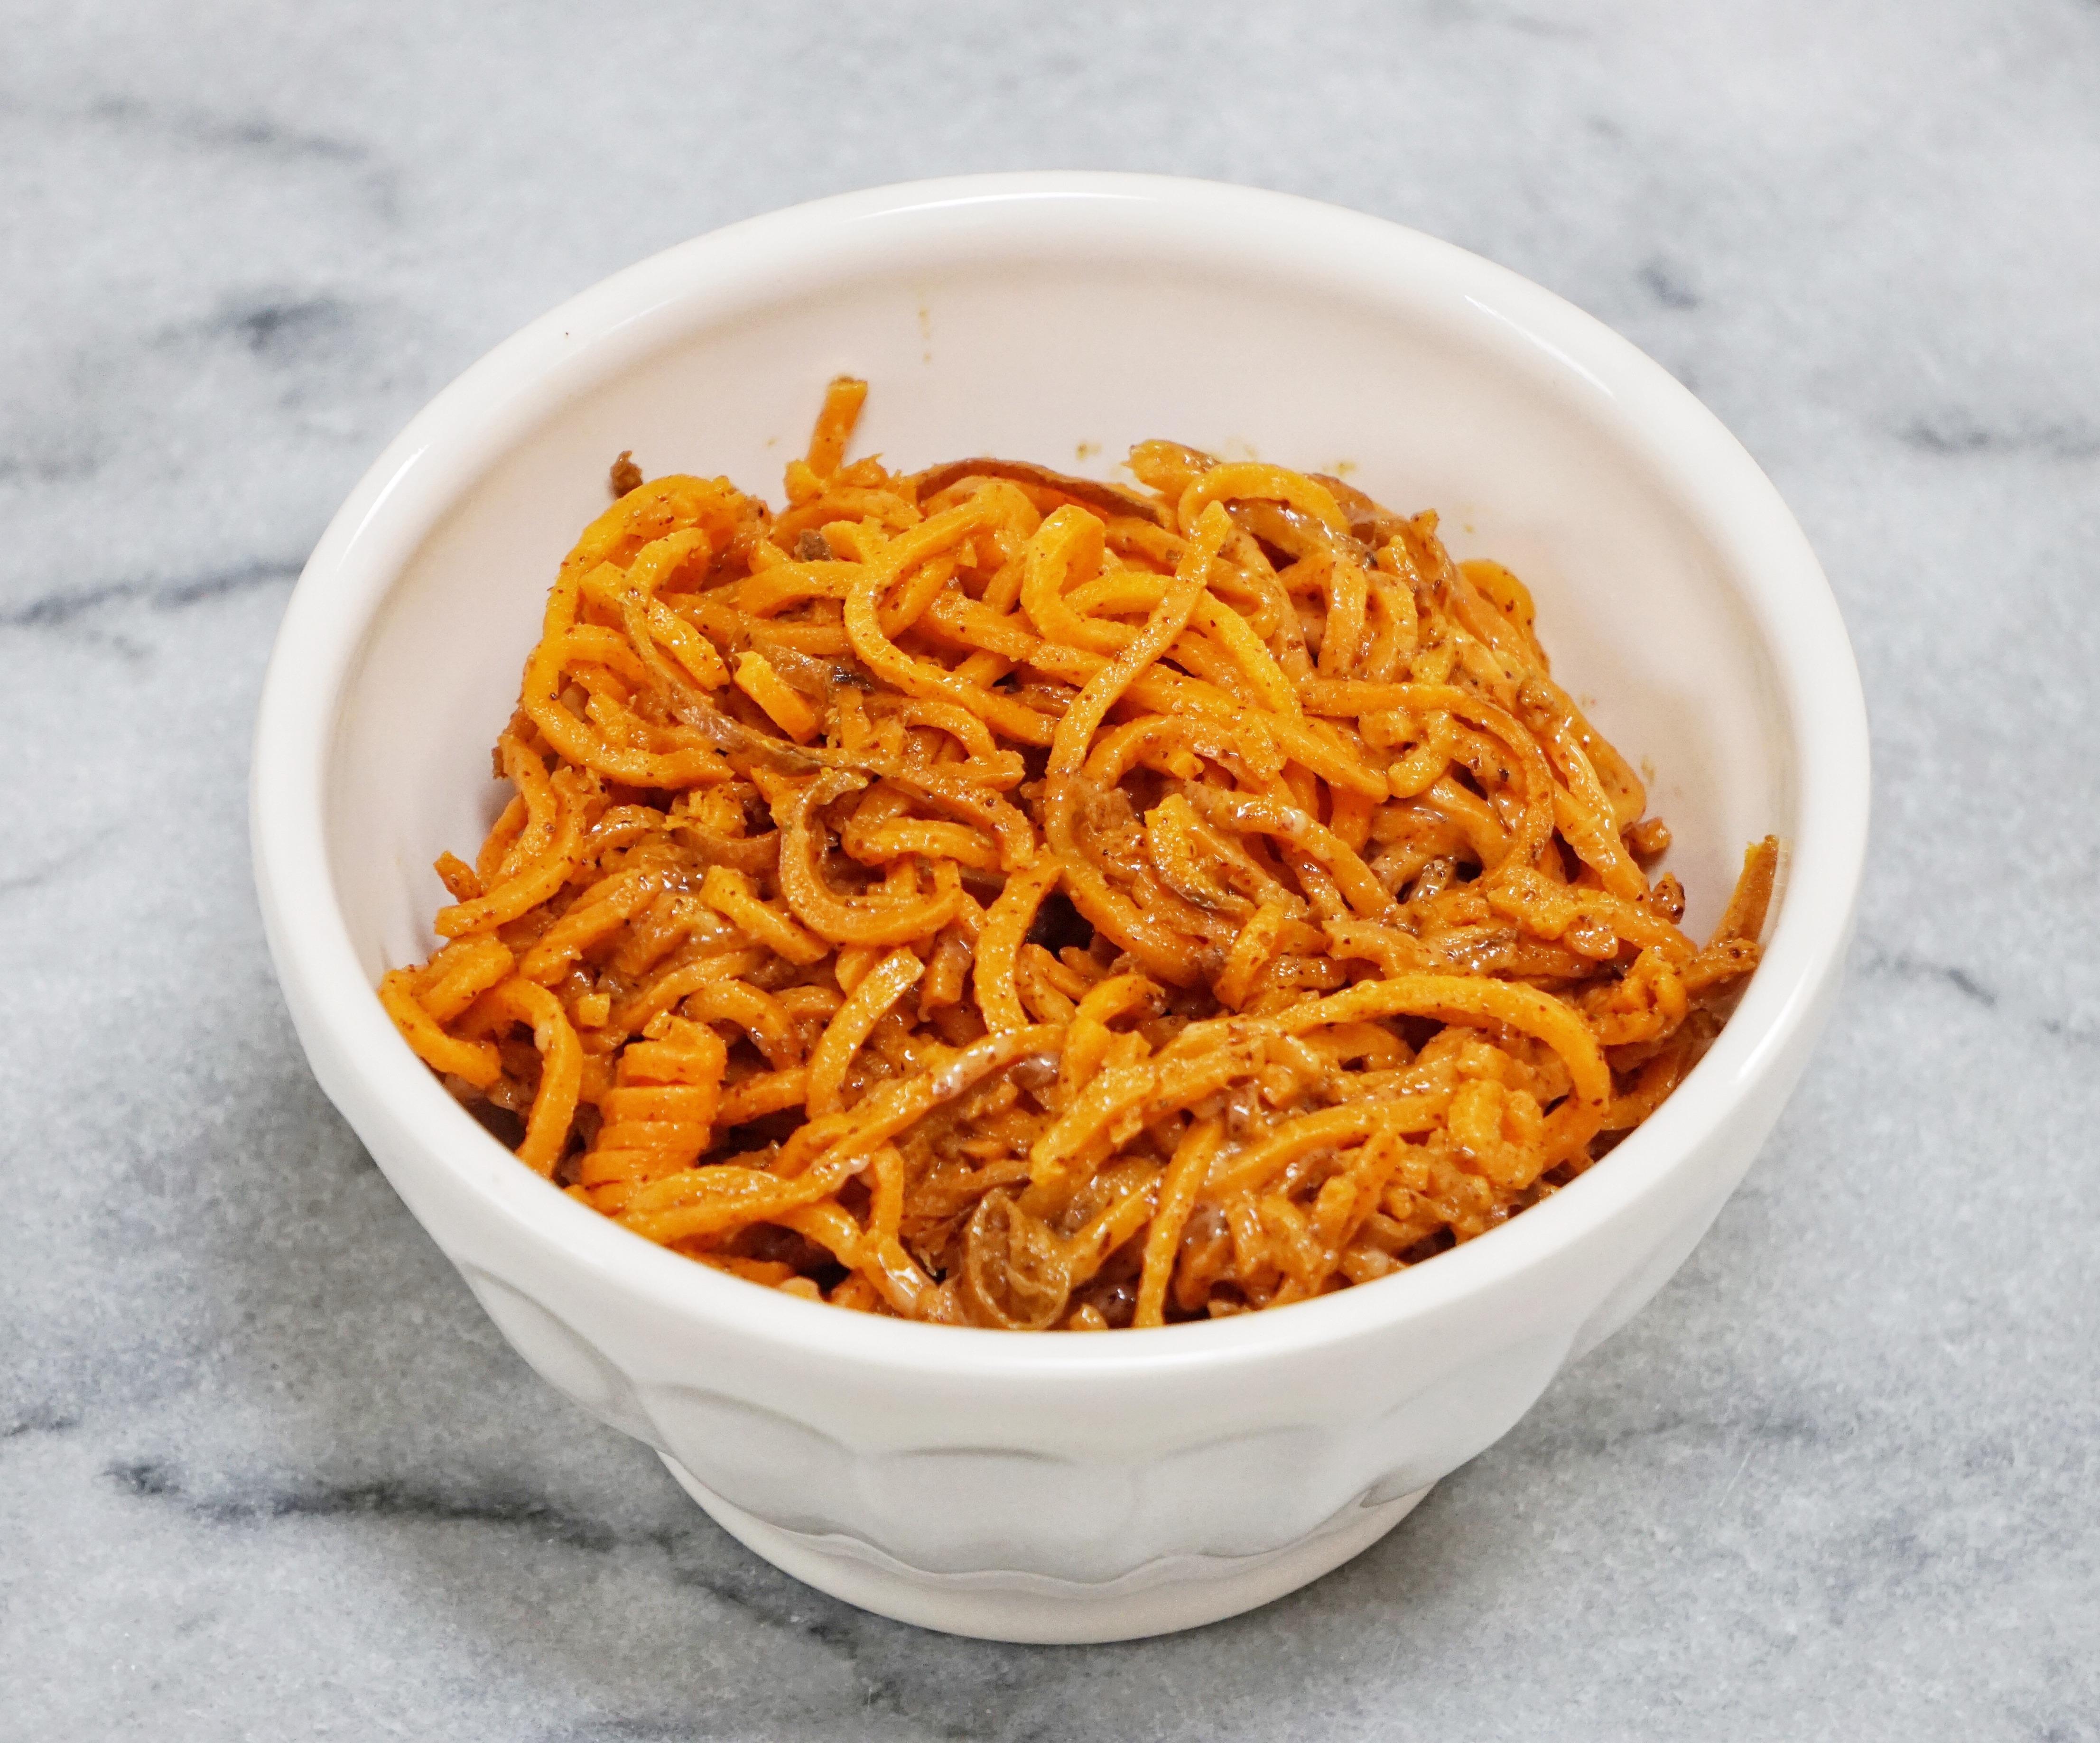 Sweet Potato Noodles with Honey Almond Butter Dressing Leahs Plate9 - Sweet Potato Noodles with a Honey Almond Butter Sauce